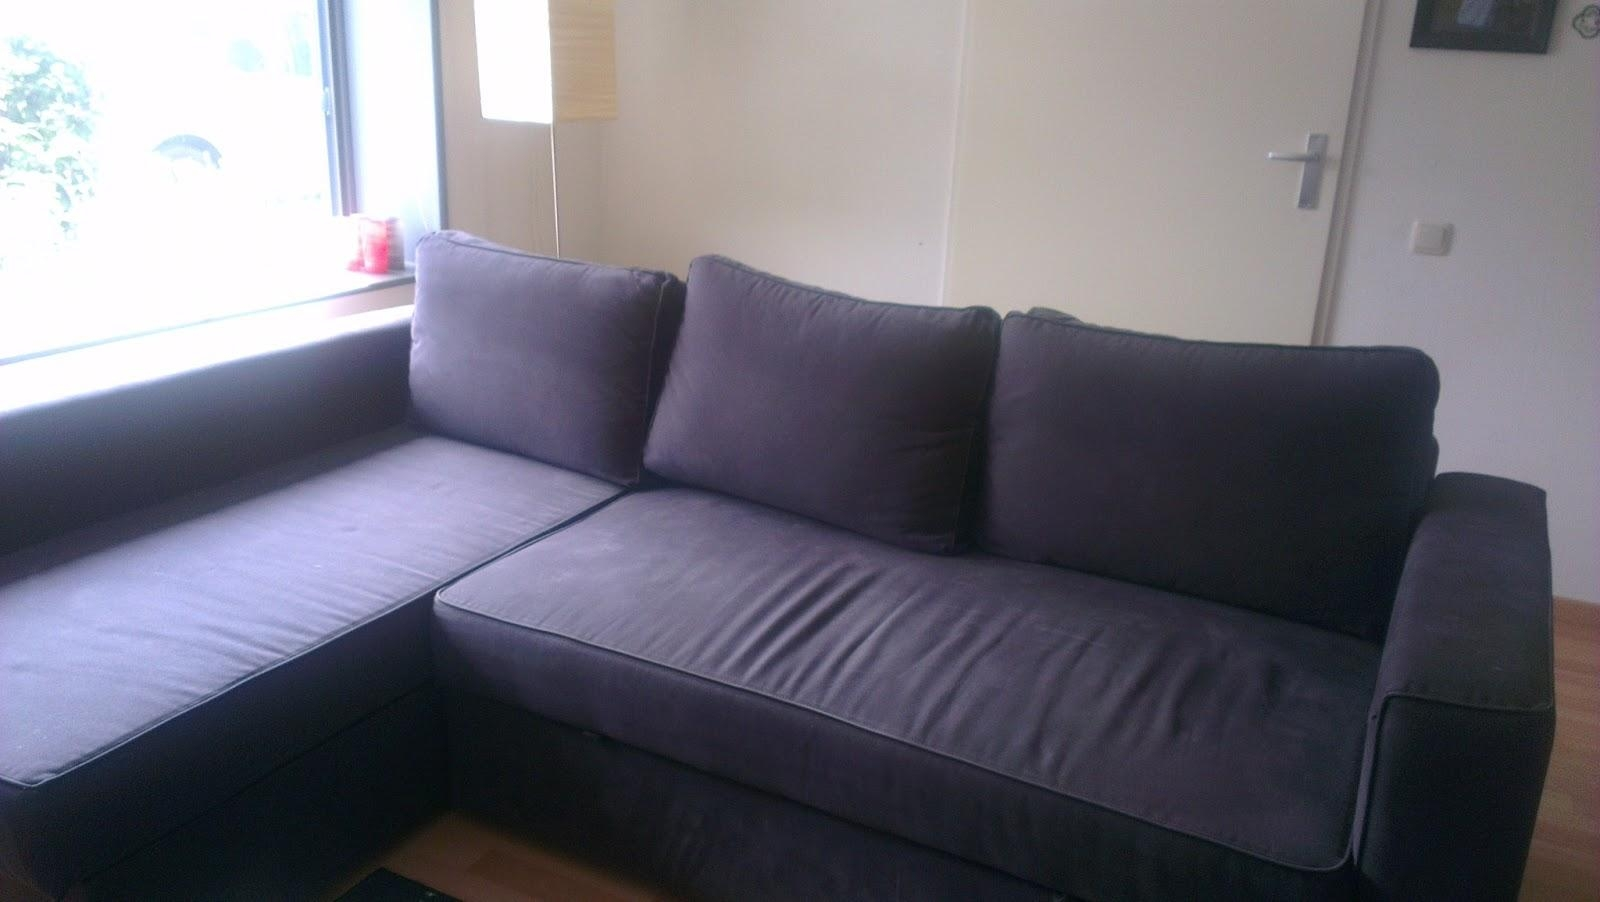 Ace The Adventure: Ikea Vrijdag: Manstad Bank/sofa Pertaining To Manstad Sofa Bed (View 4 of 20)